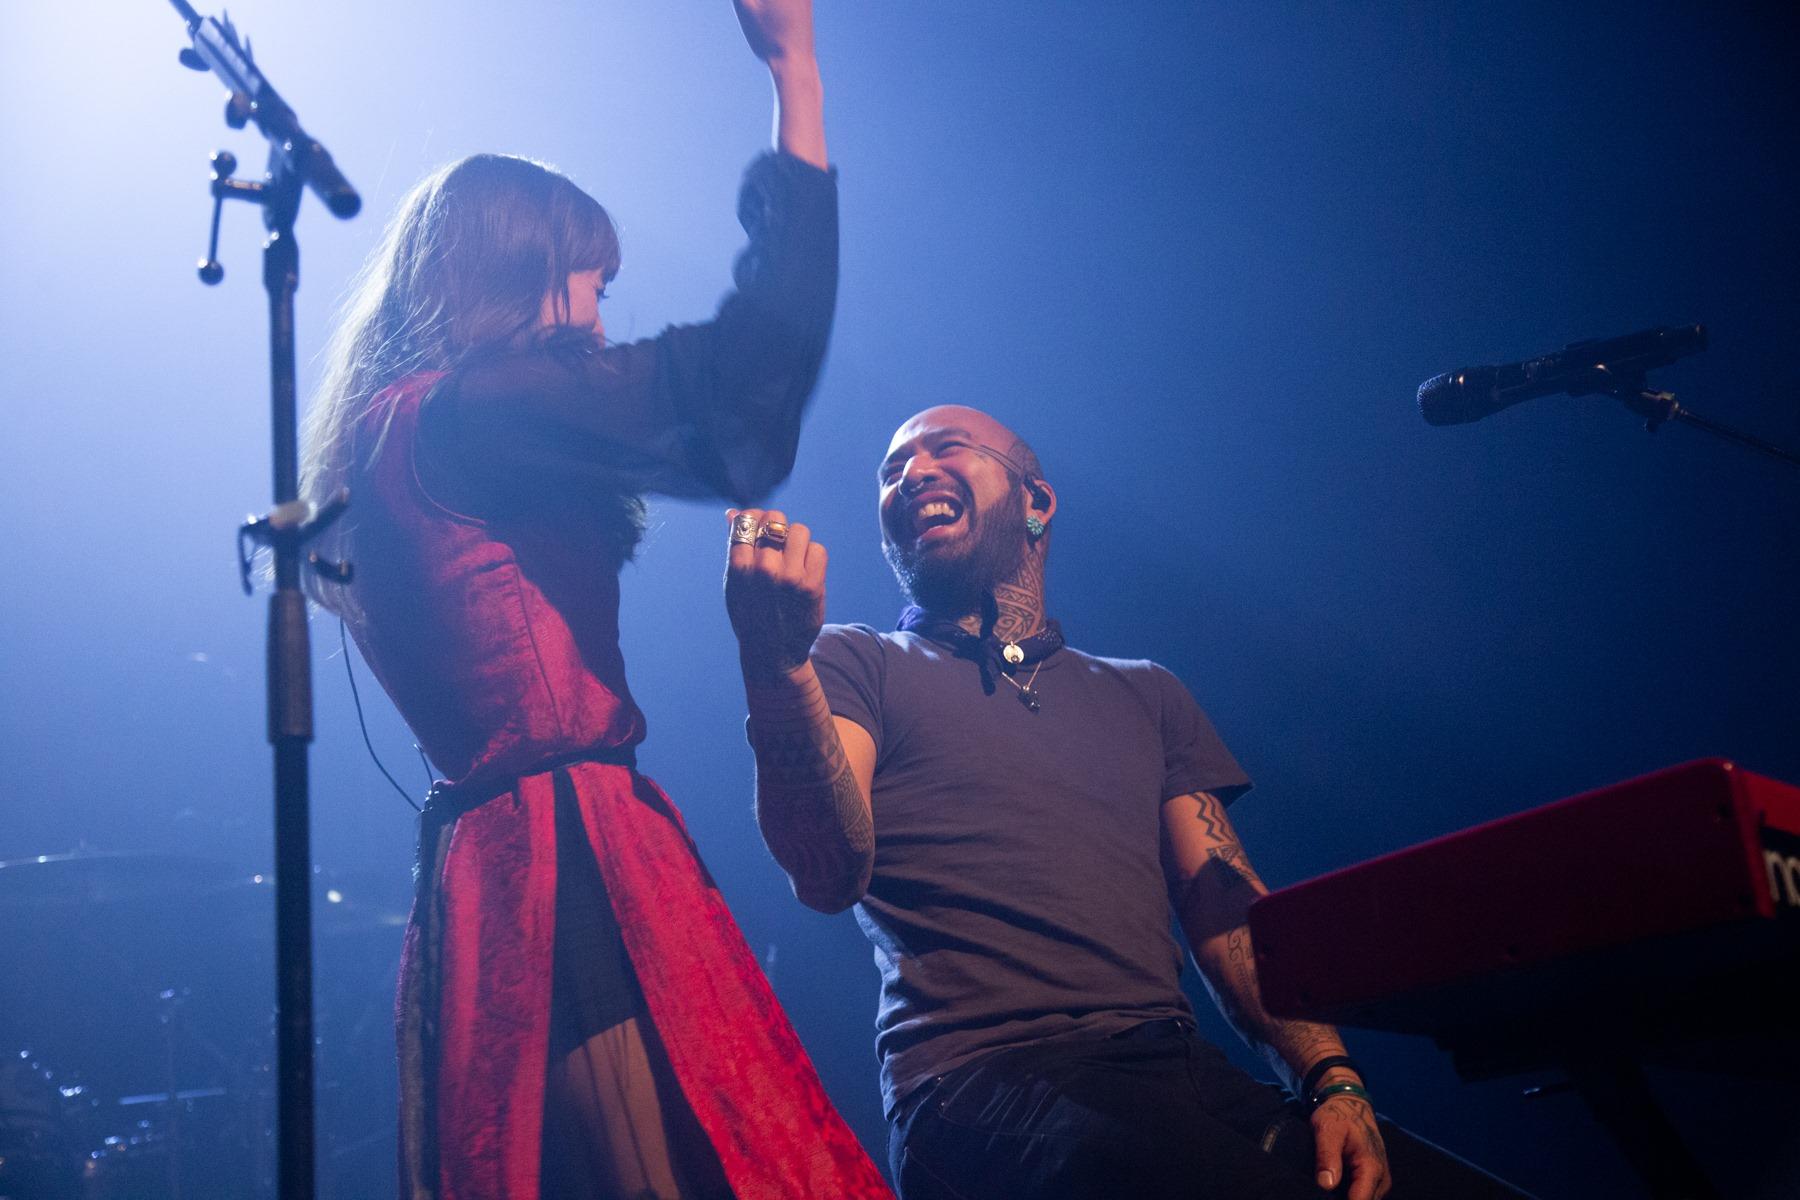 Watch Now: Nahko & Ayla Nereo - Tus Pies (Your Feet) (Live)